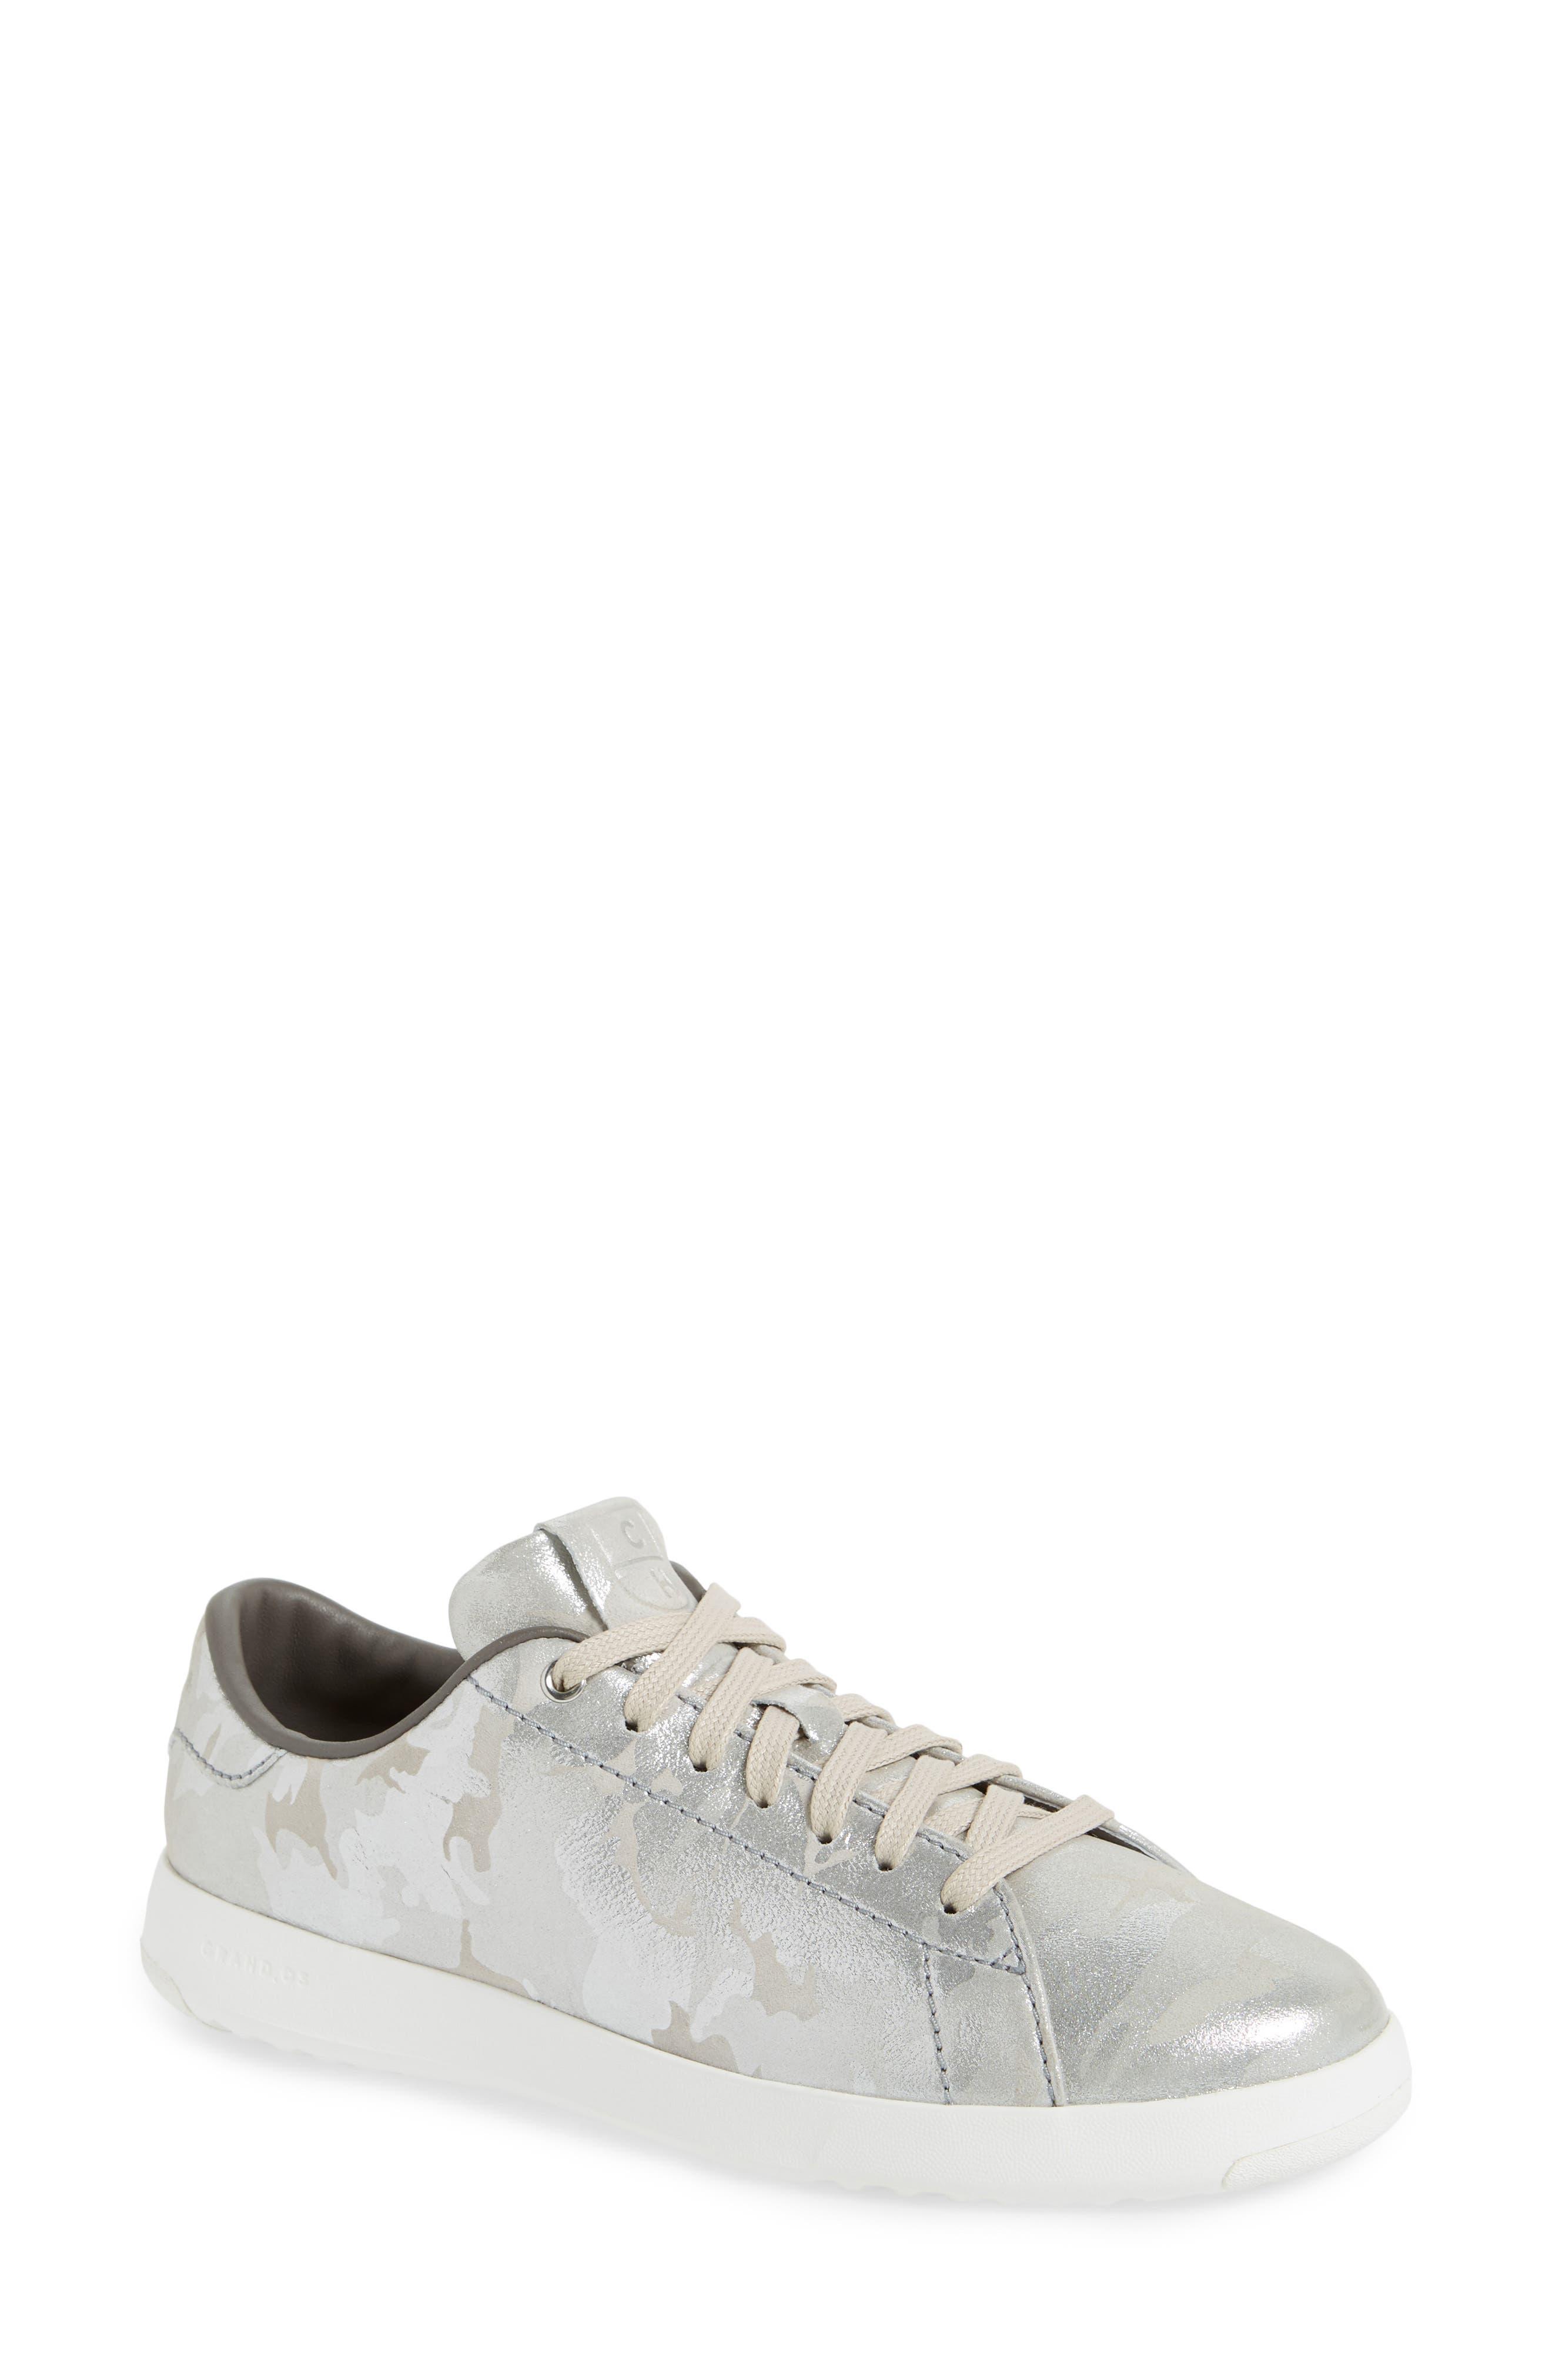 GrandPro Tennis Shoe,                             Main thumbnail 1, color,                             Dove Metallic Camo Leather